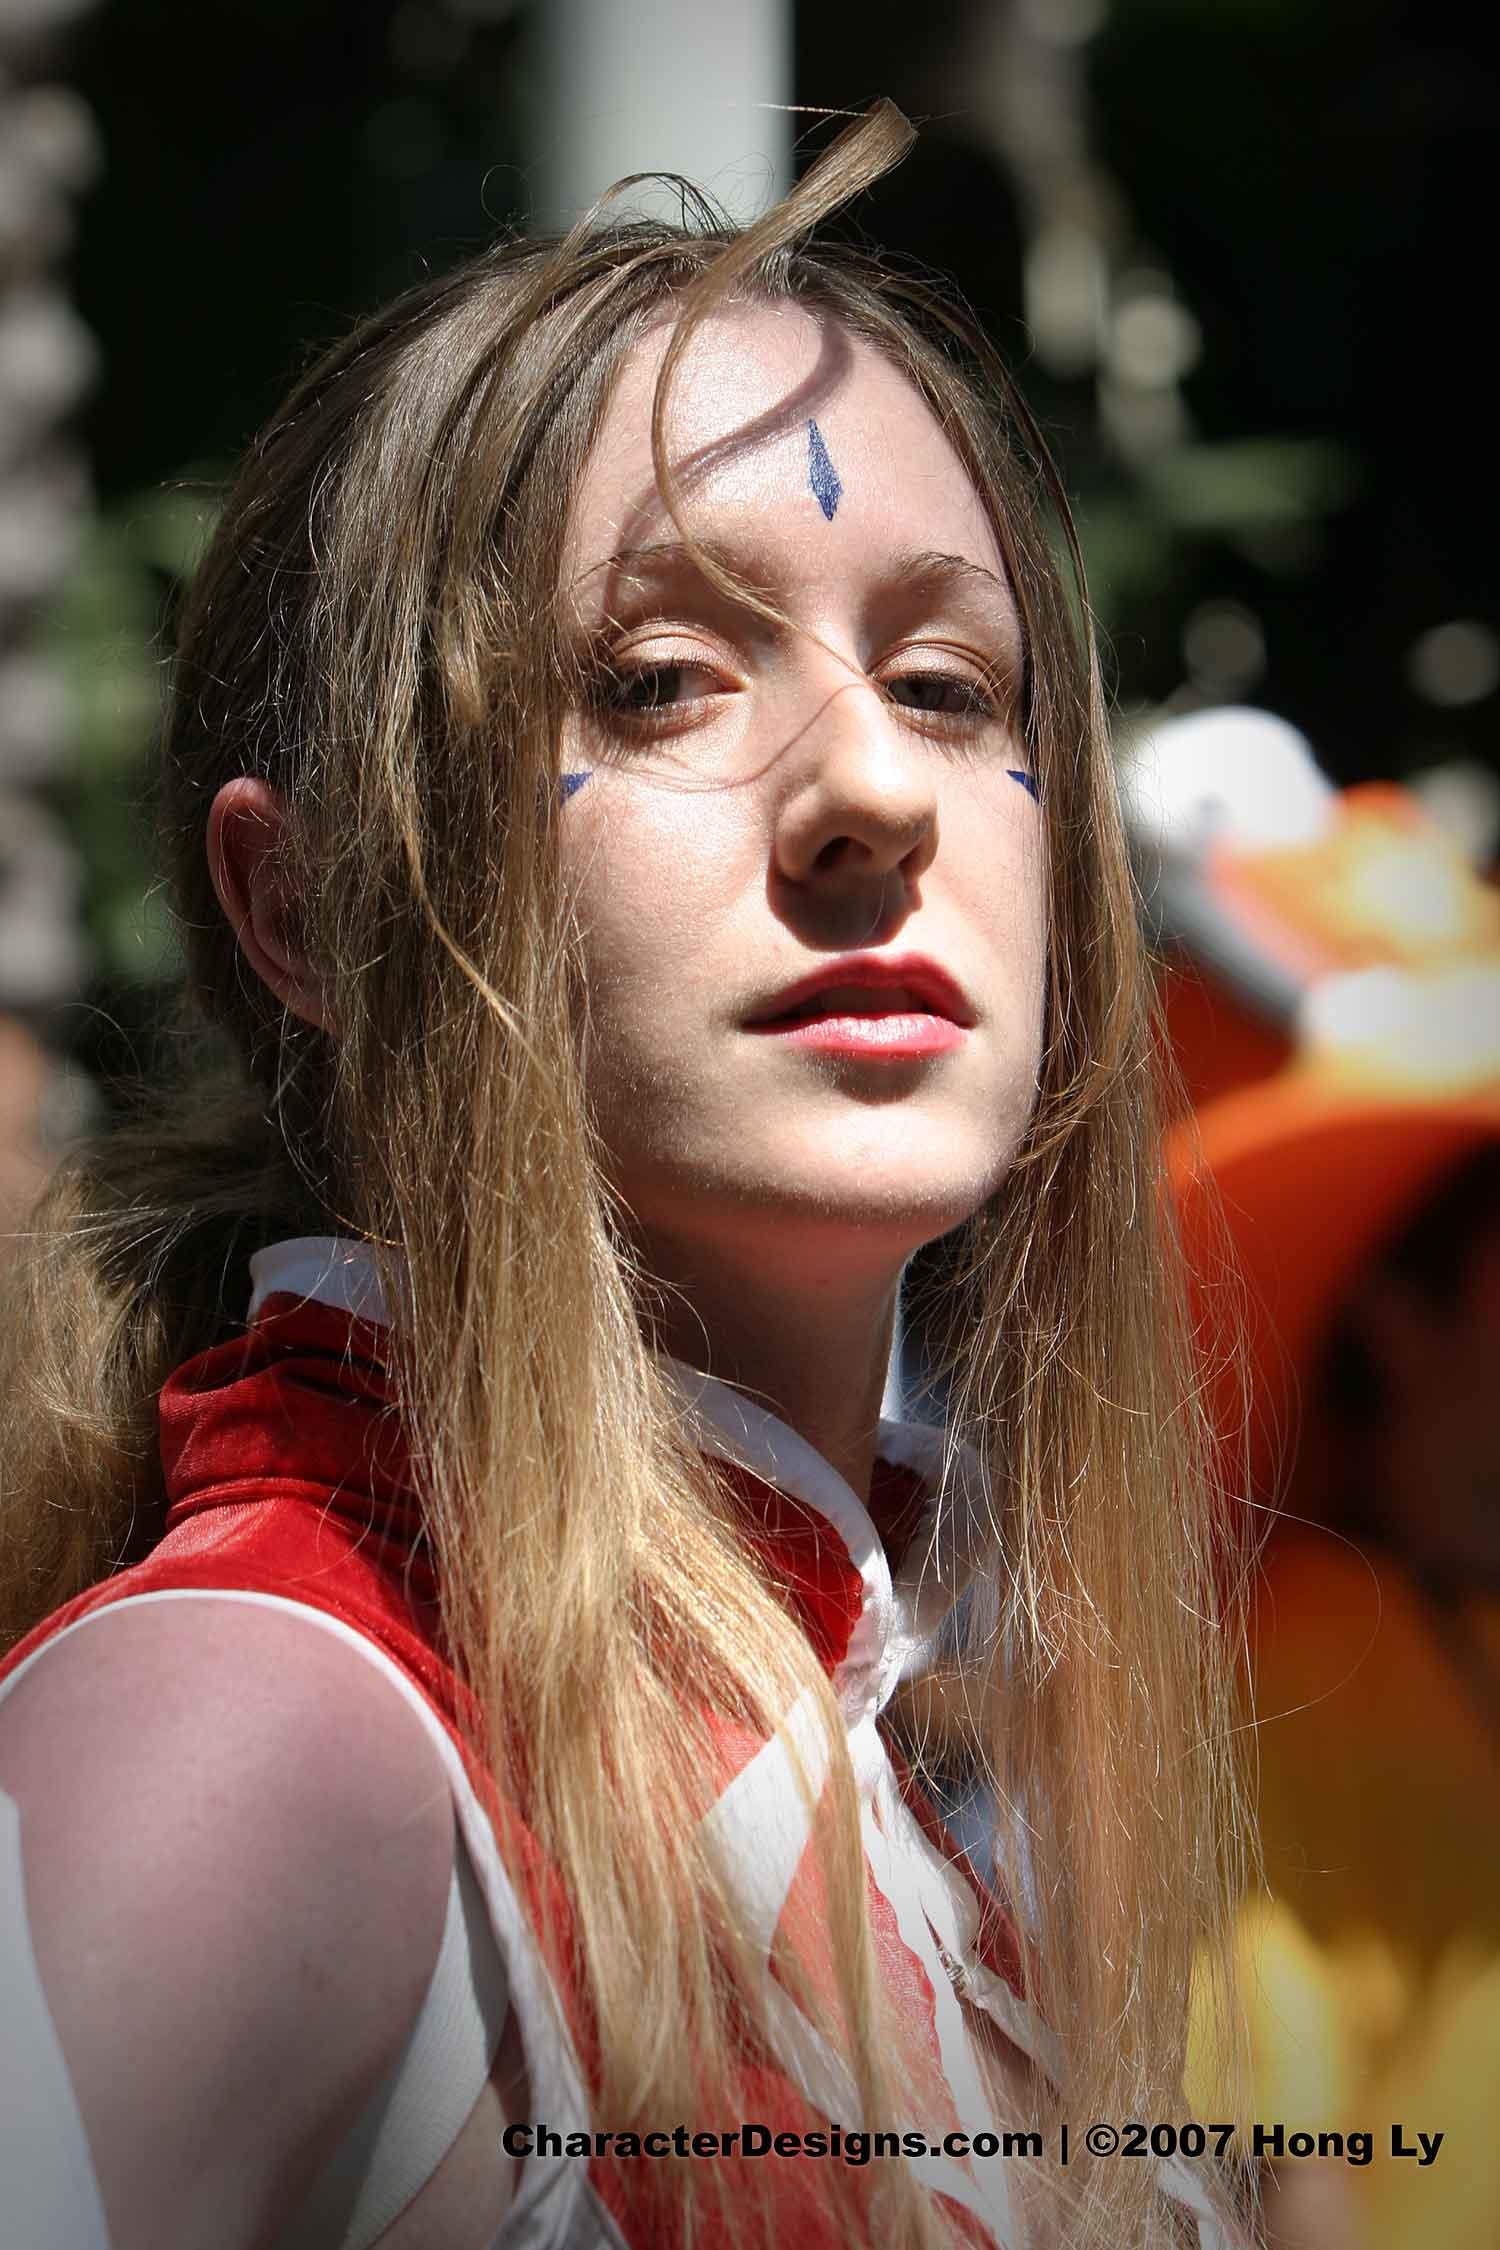 Faces_of_AX_2006_102.jpg